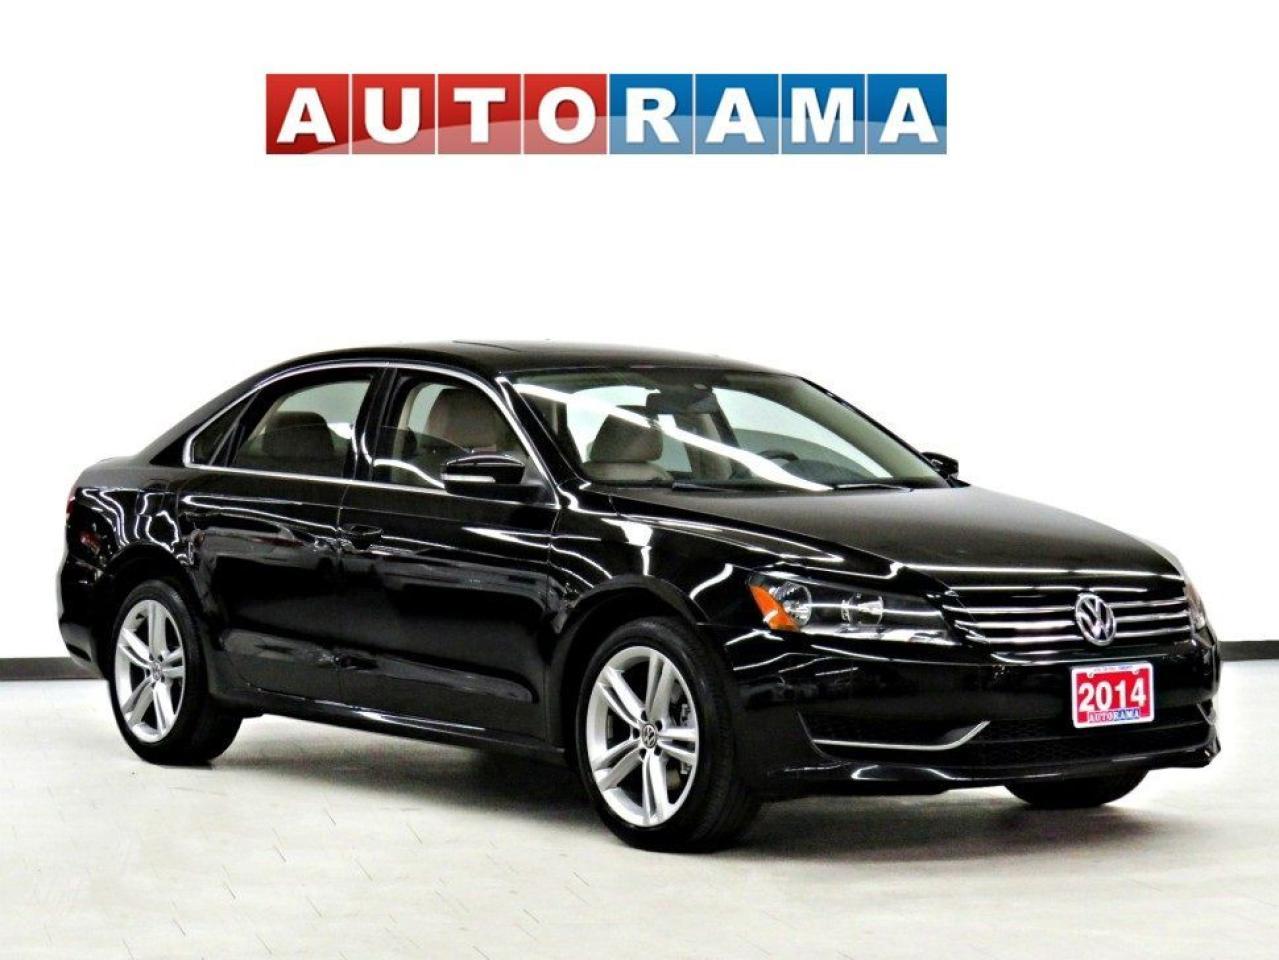 2014 Volkswagen Passat COMFORTLINE LEATHER SUNROOF NAVI BACK UP CAM